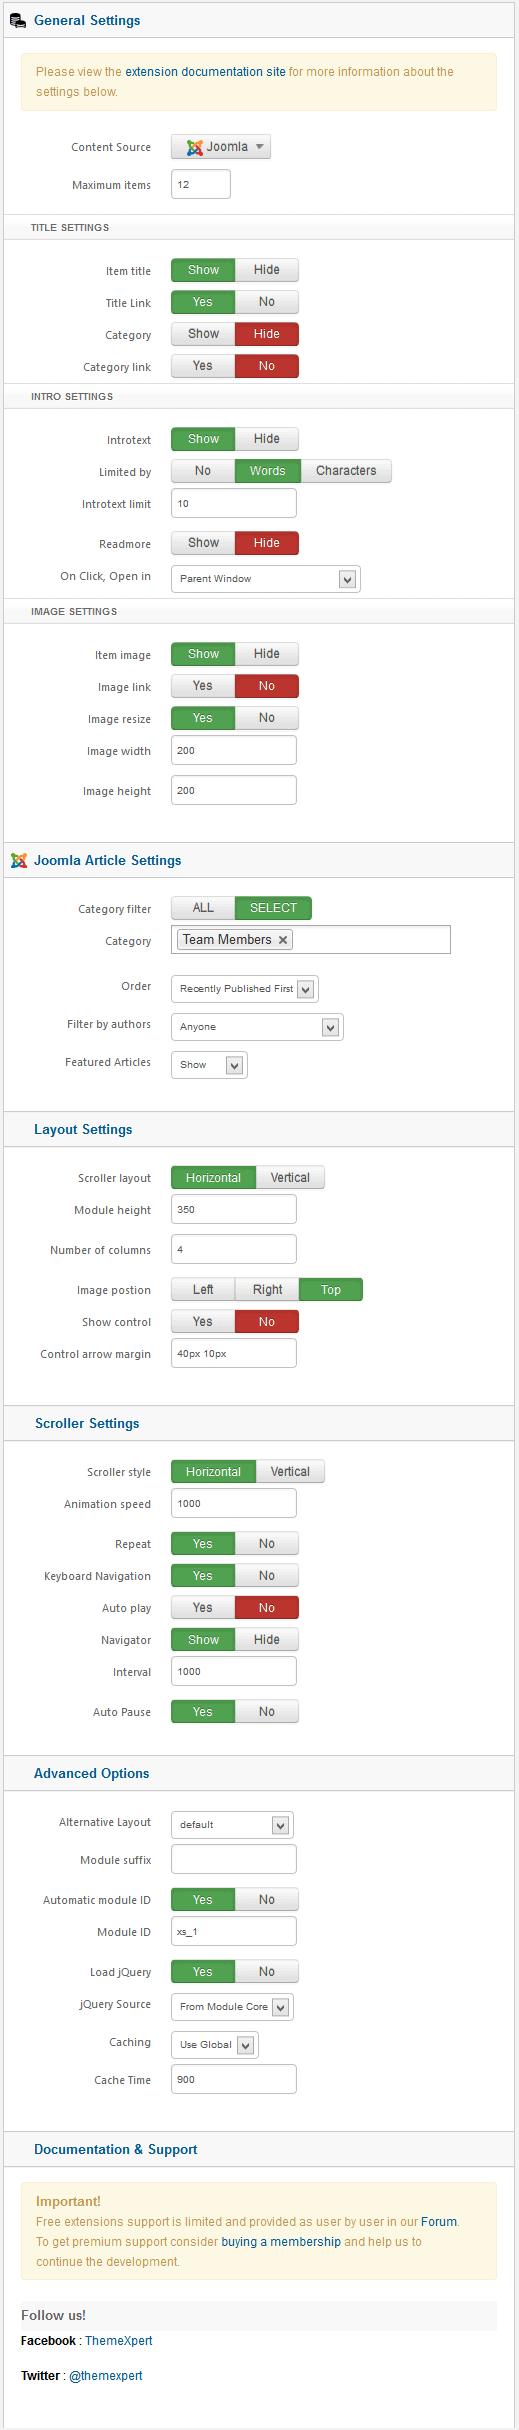 scroller settings